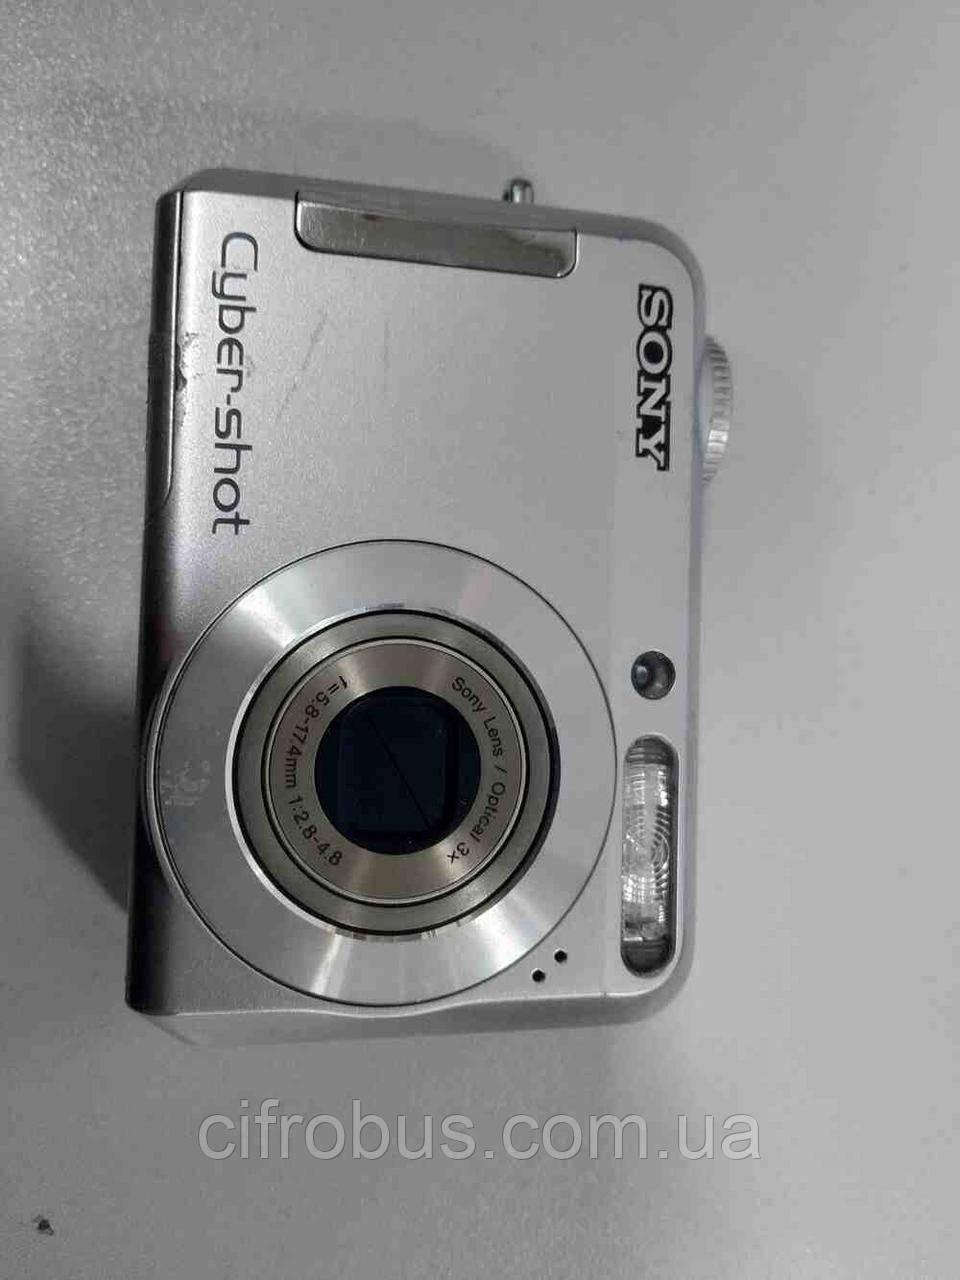 Б/У Sony Cyber-shot DSC-S650